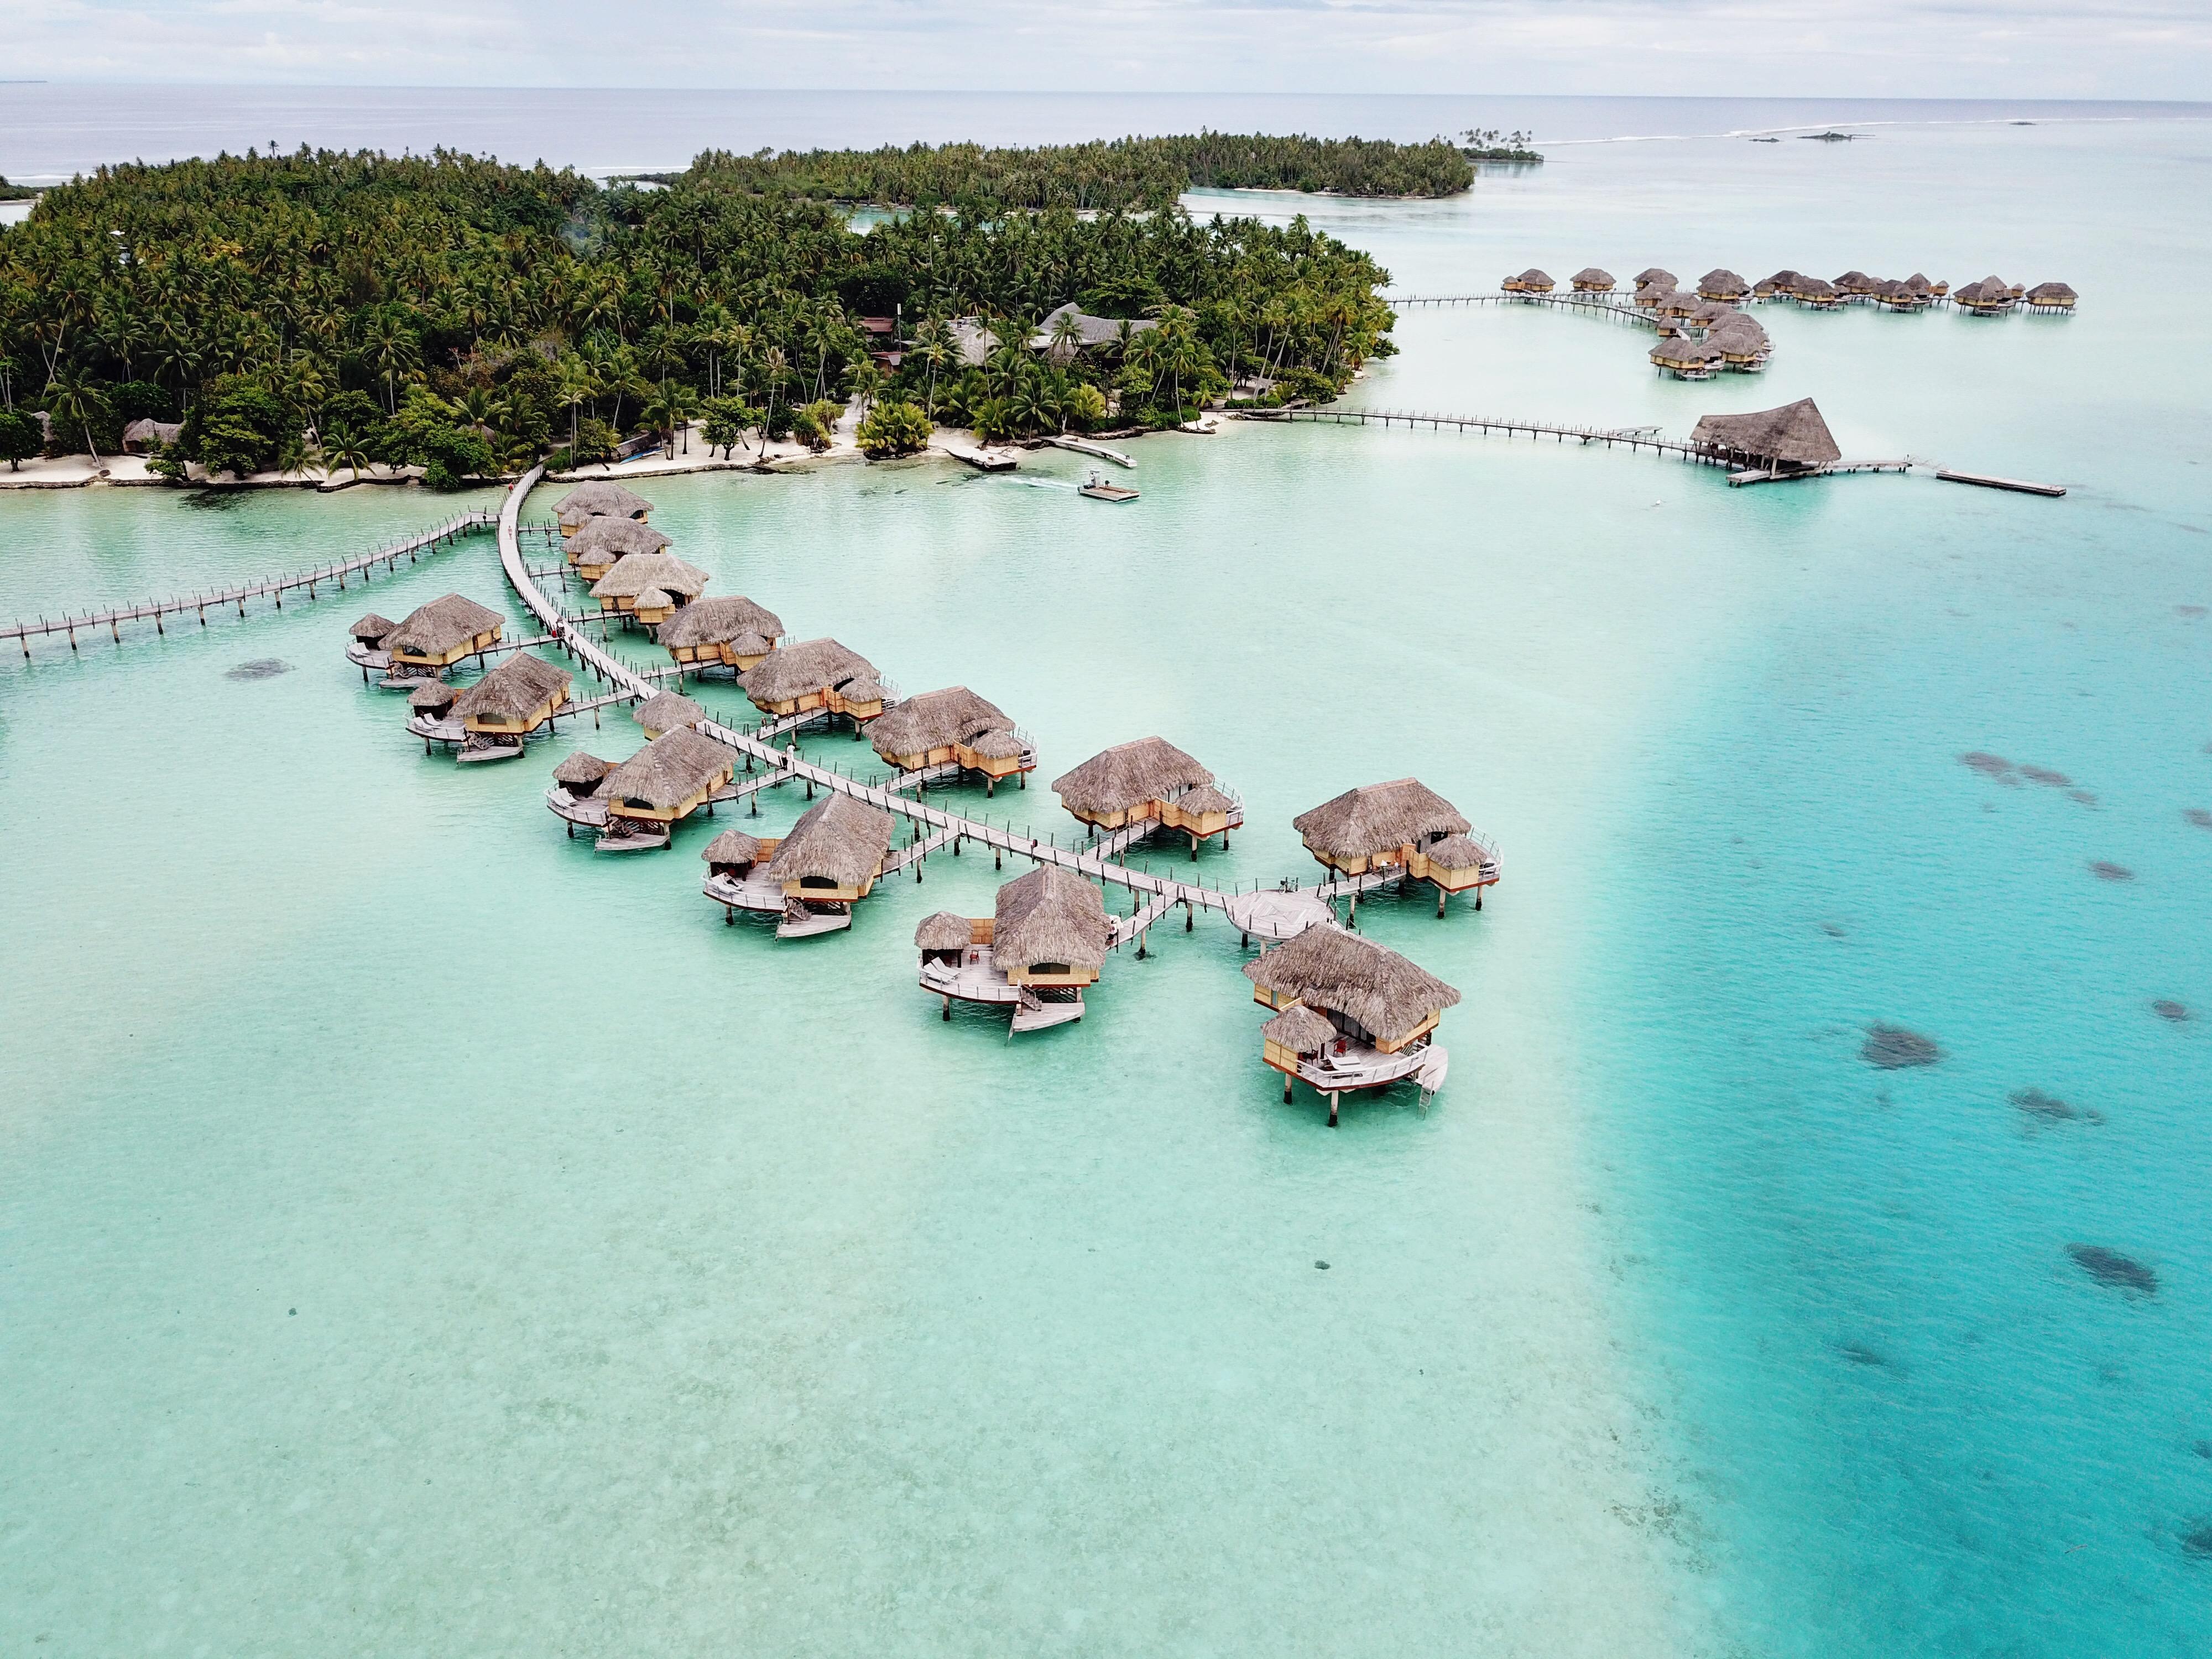 Our Tahiti Trip - Travel To Tahiti - Le Taha'a Resort + Spa, Relais Chateaux - French Polynesia Vacation - Overwater Bungalows - Trip to Tahiti - Bora Bora - Communikait by Kait Hanson